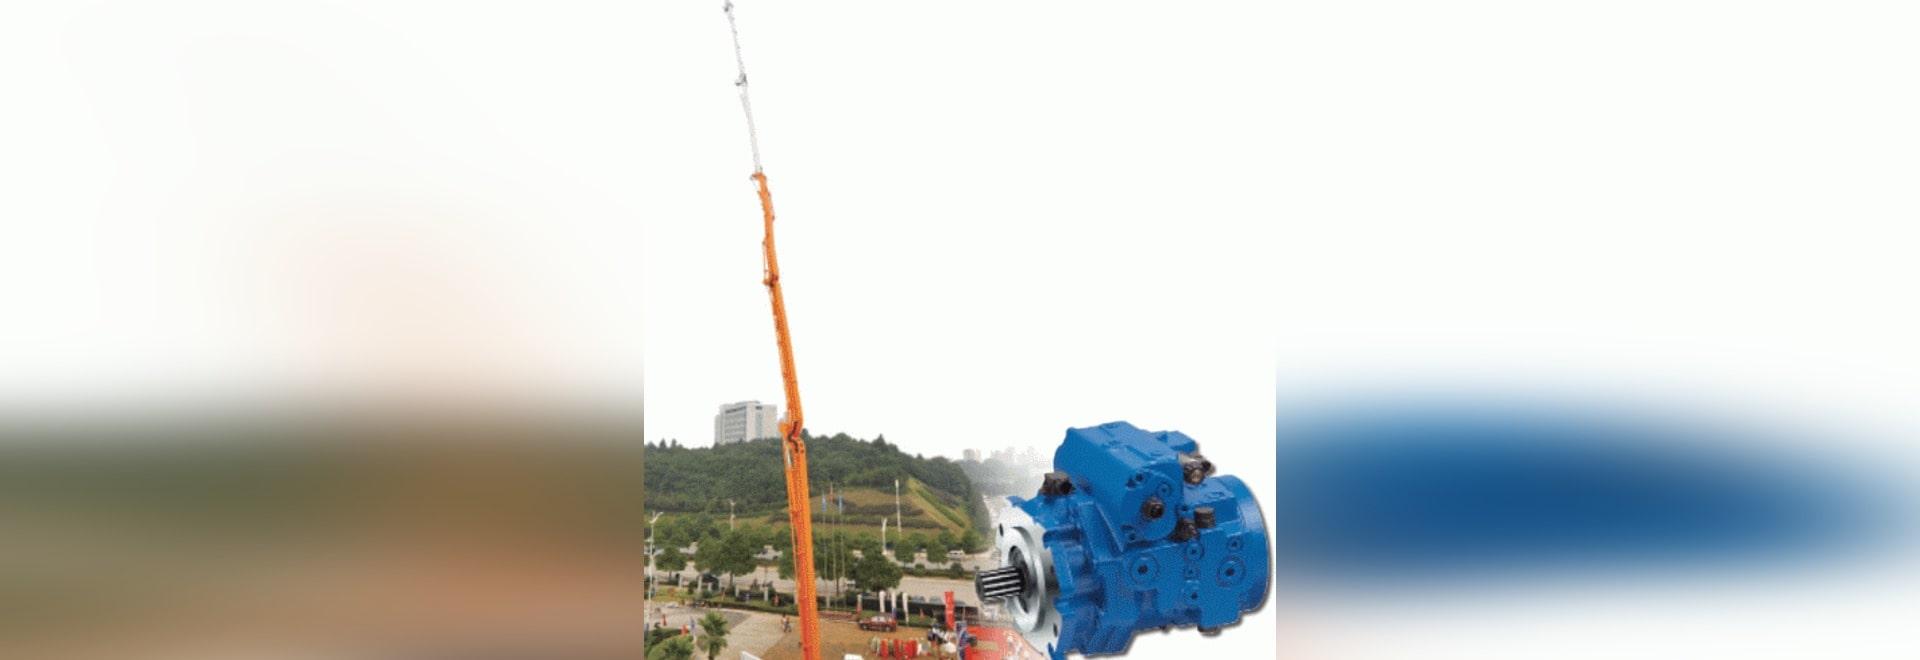 Mobile Concrete Pump Breaks 100-m Height Barrier